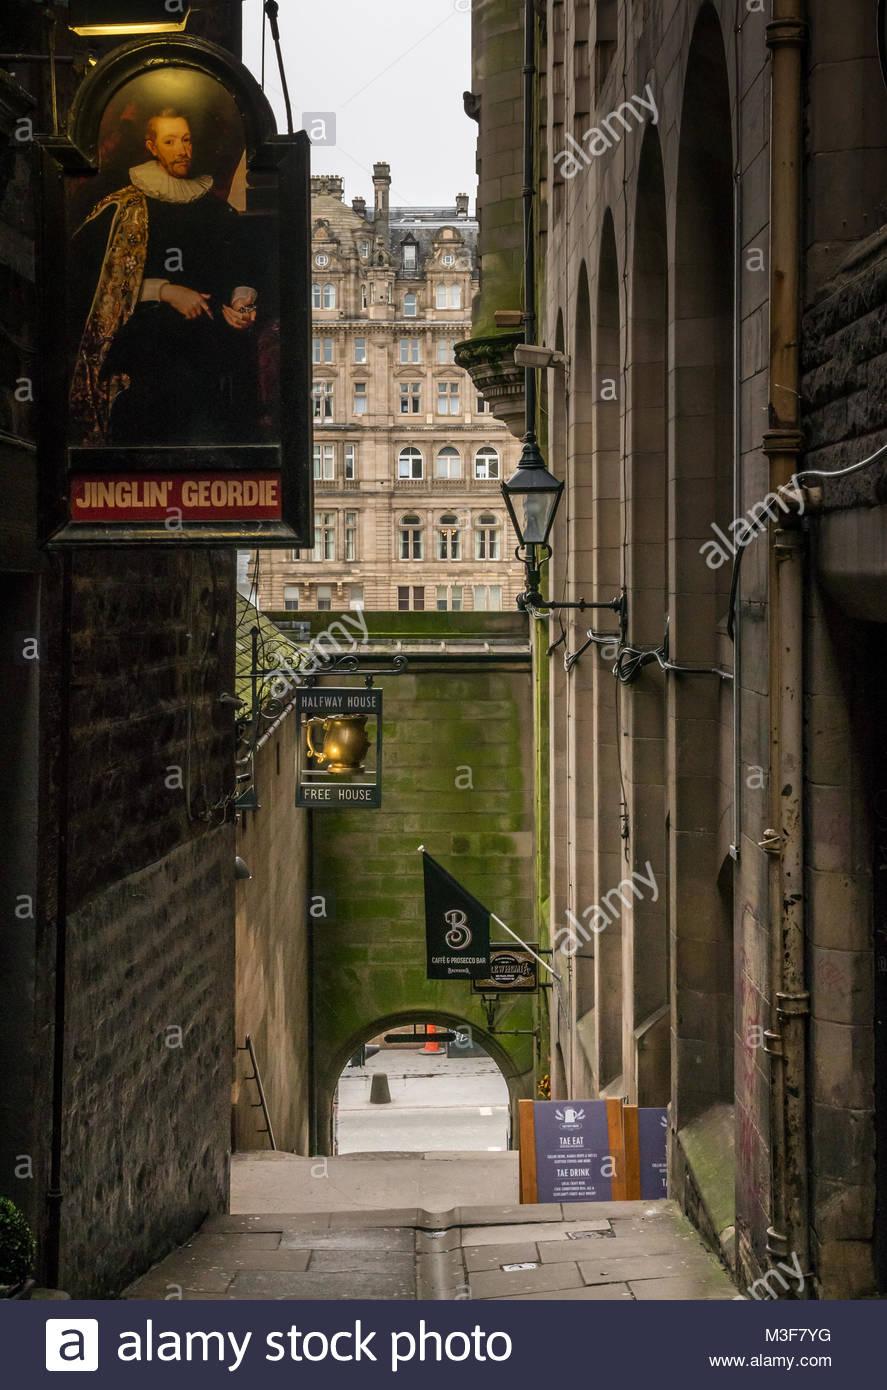 Alley, Fleshmarket Close, with Jinglin Geordie and Halfway House pub signs, Fleshmarket Close, Edinburgh, Scotland, - Stock Image